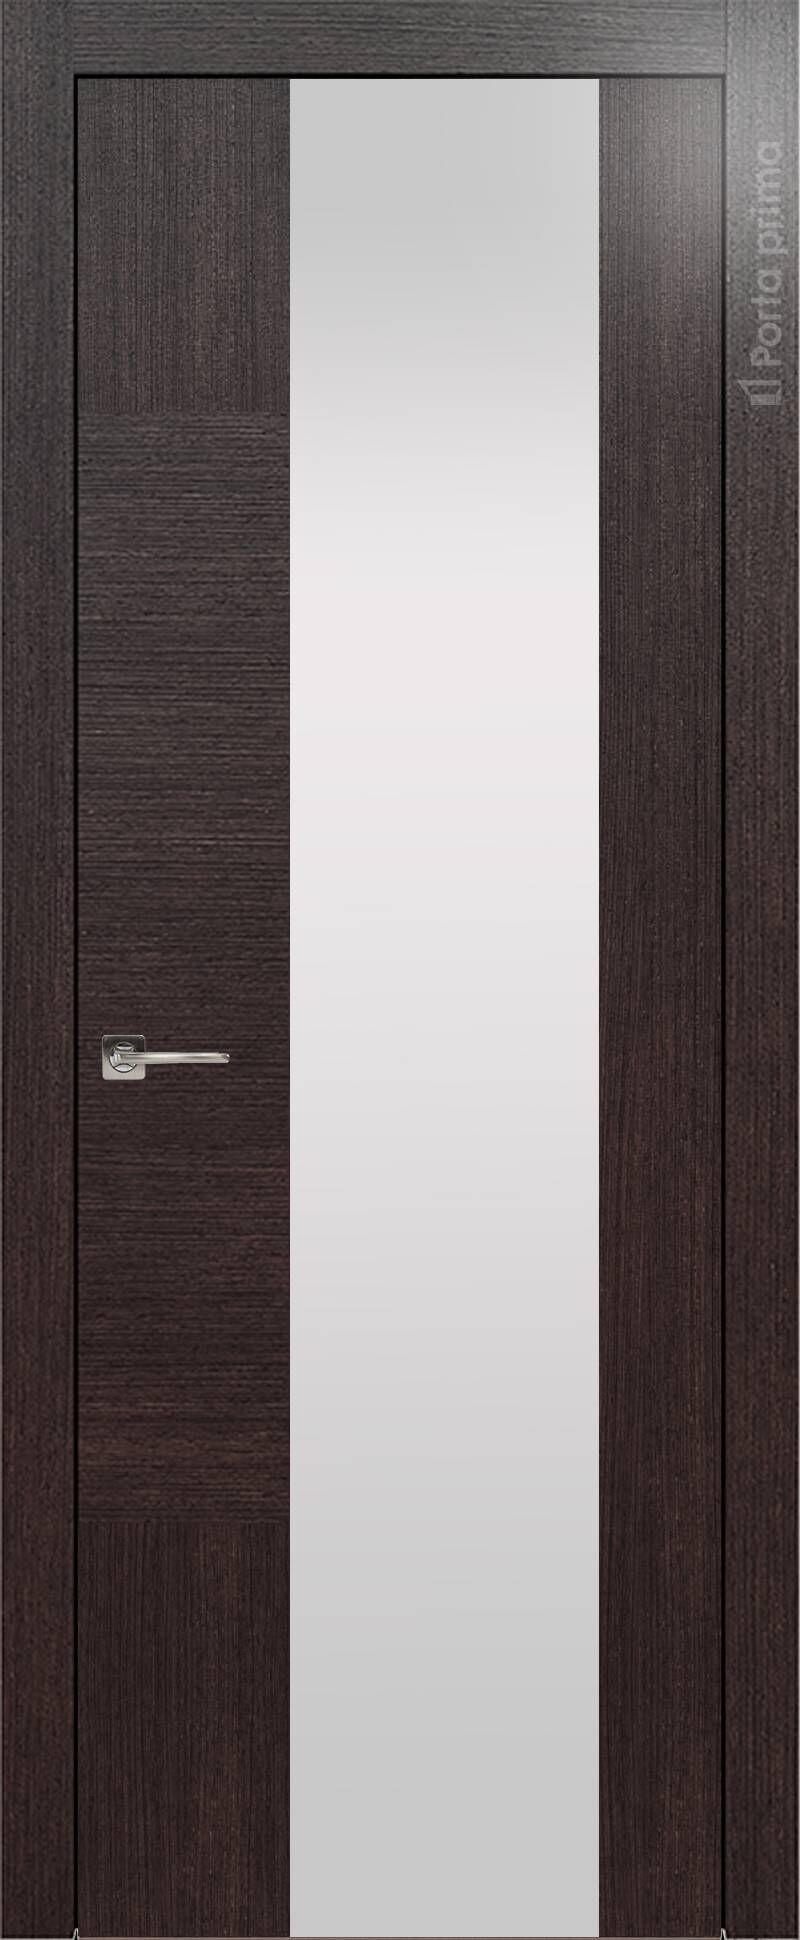 Tivoli Е-1 цвет - Венге Шоколад Со стеклом (ДО)